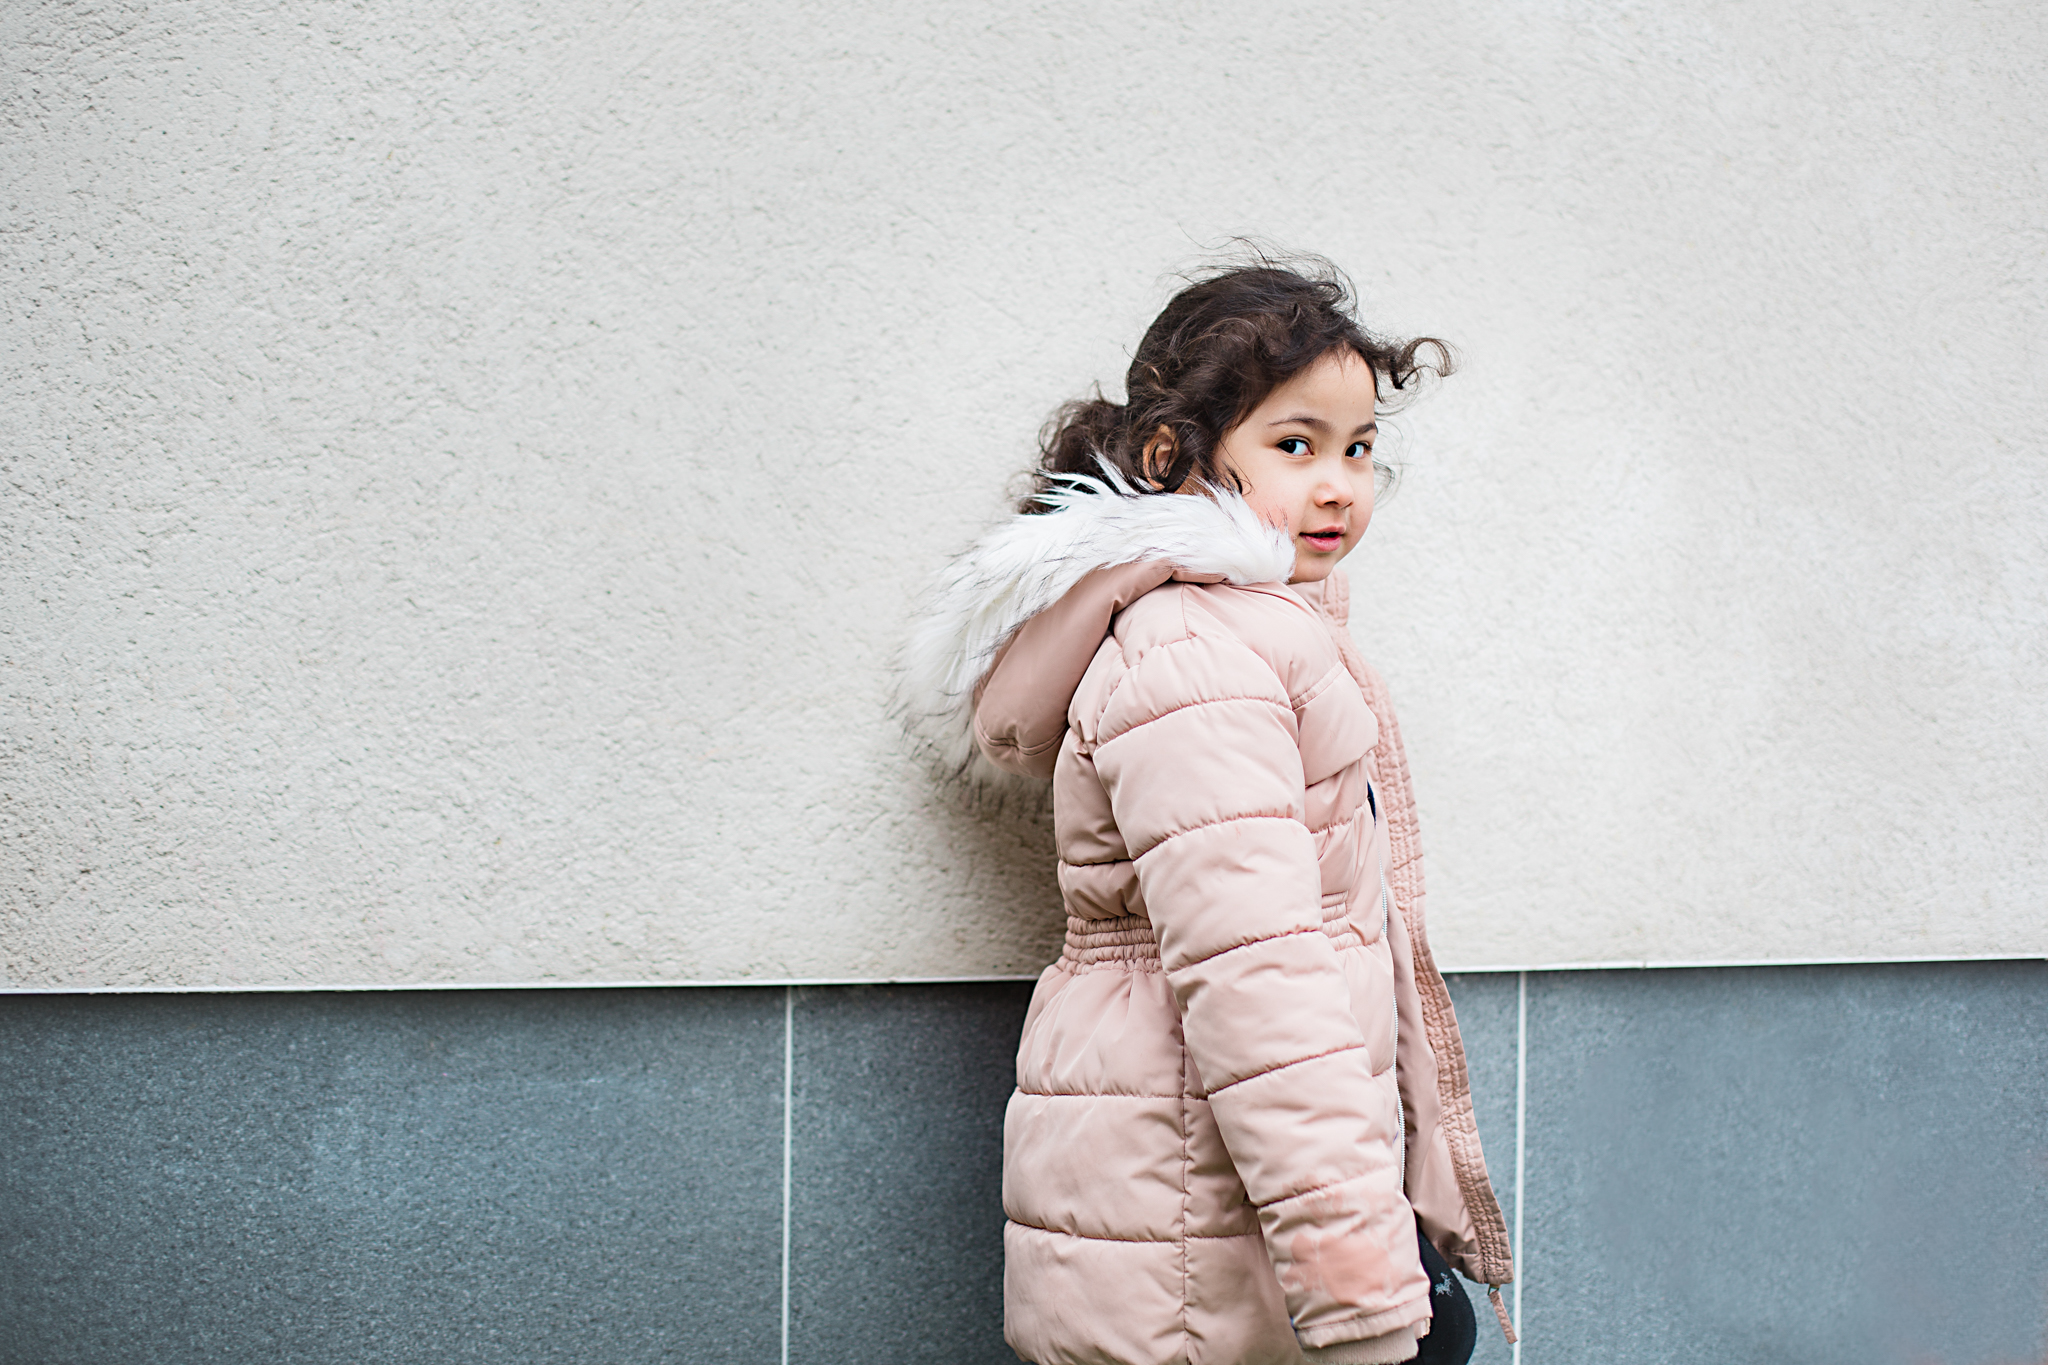 Child Portrait Photographer - Bedford Photographer.jpg